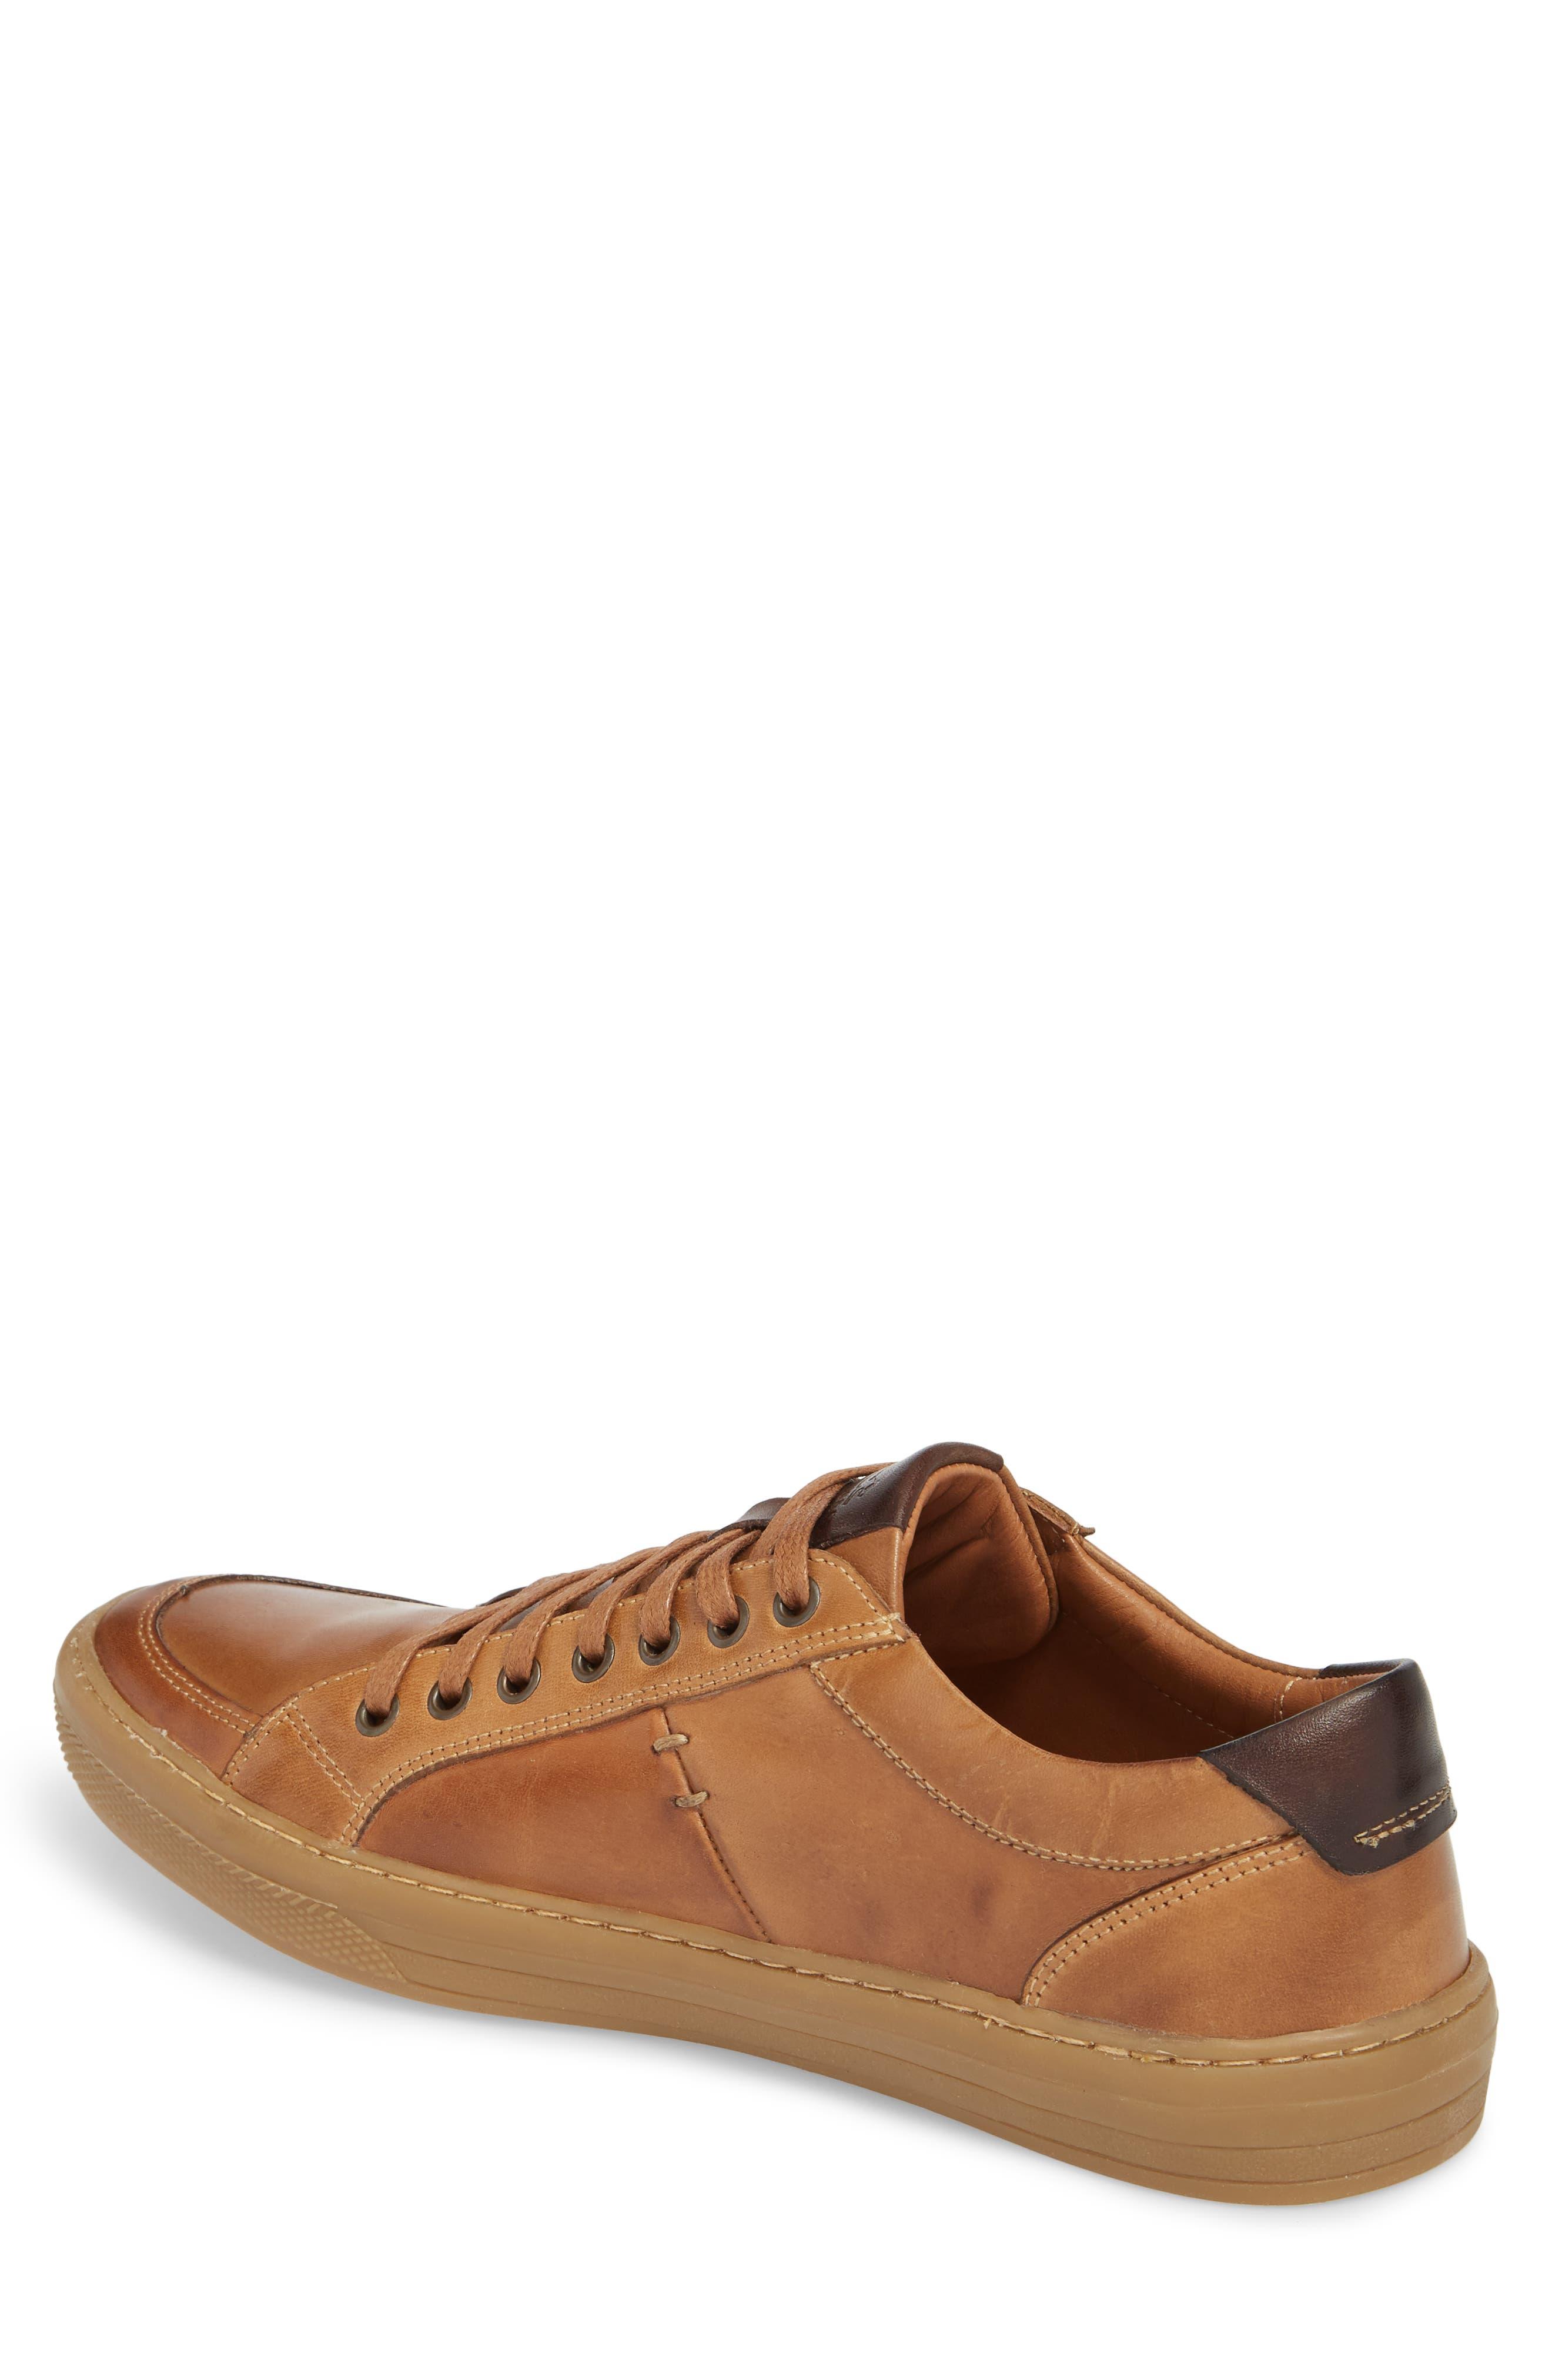 Bilac Low Top Sneaker,                             Alternate thumbnail 2, color,                             Touch Bronze/ Castanho Leather